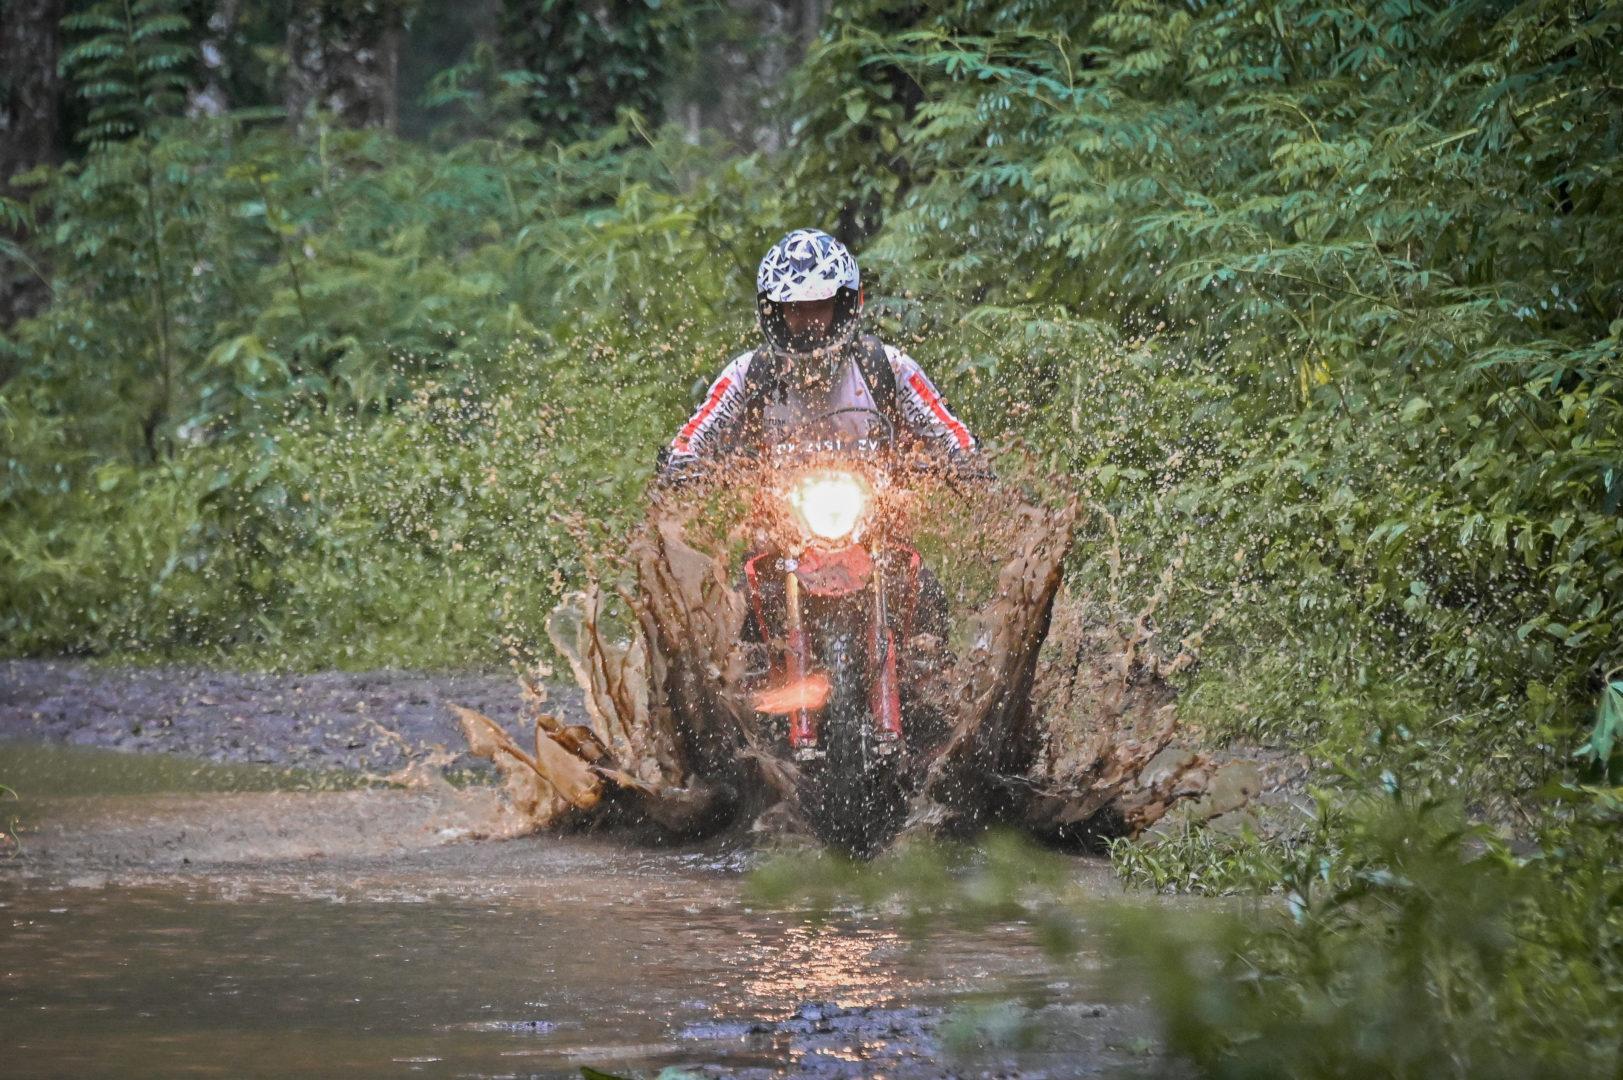 Java Dirt Bikes